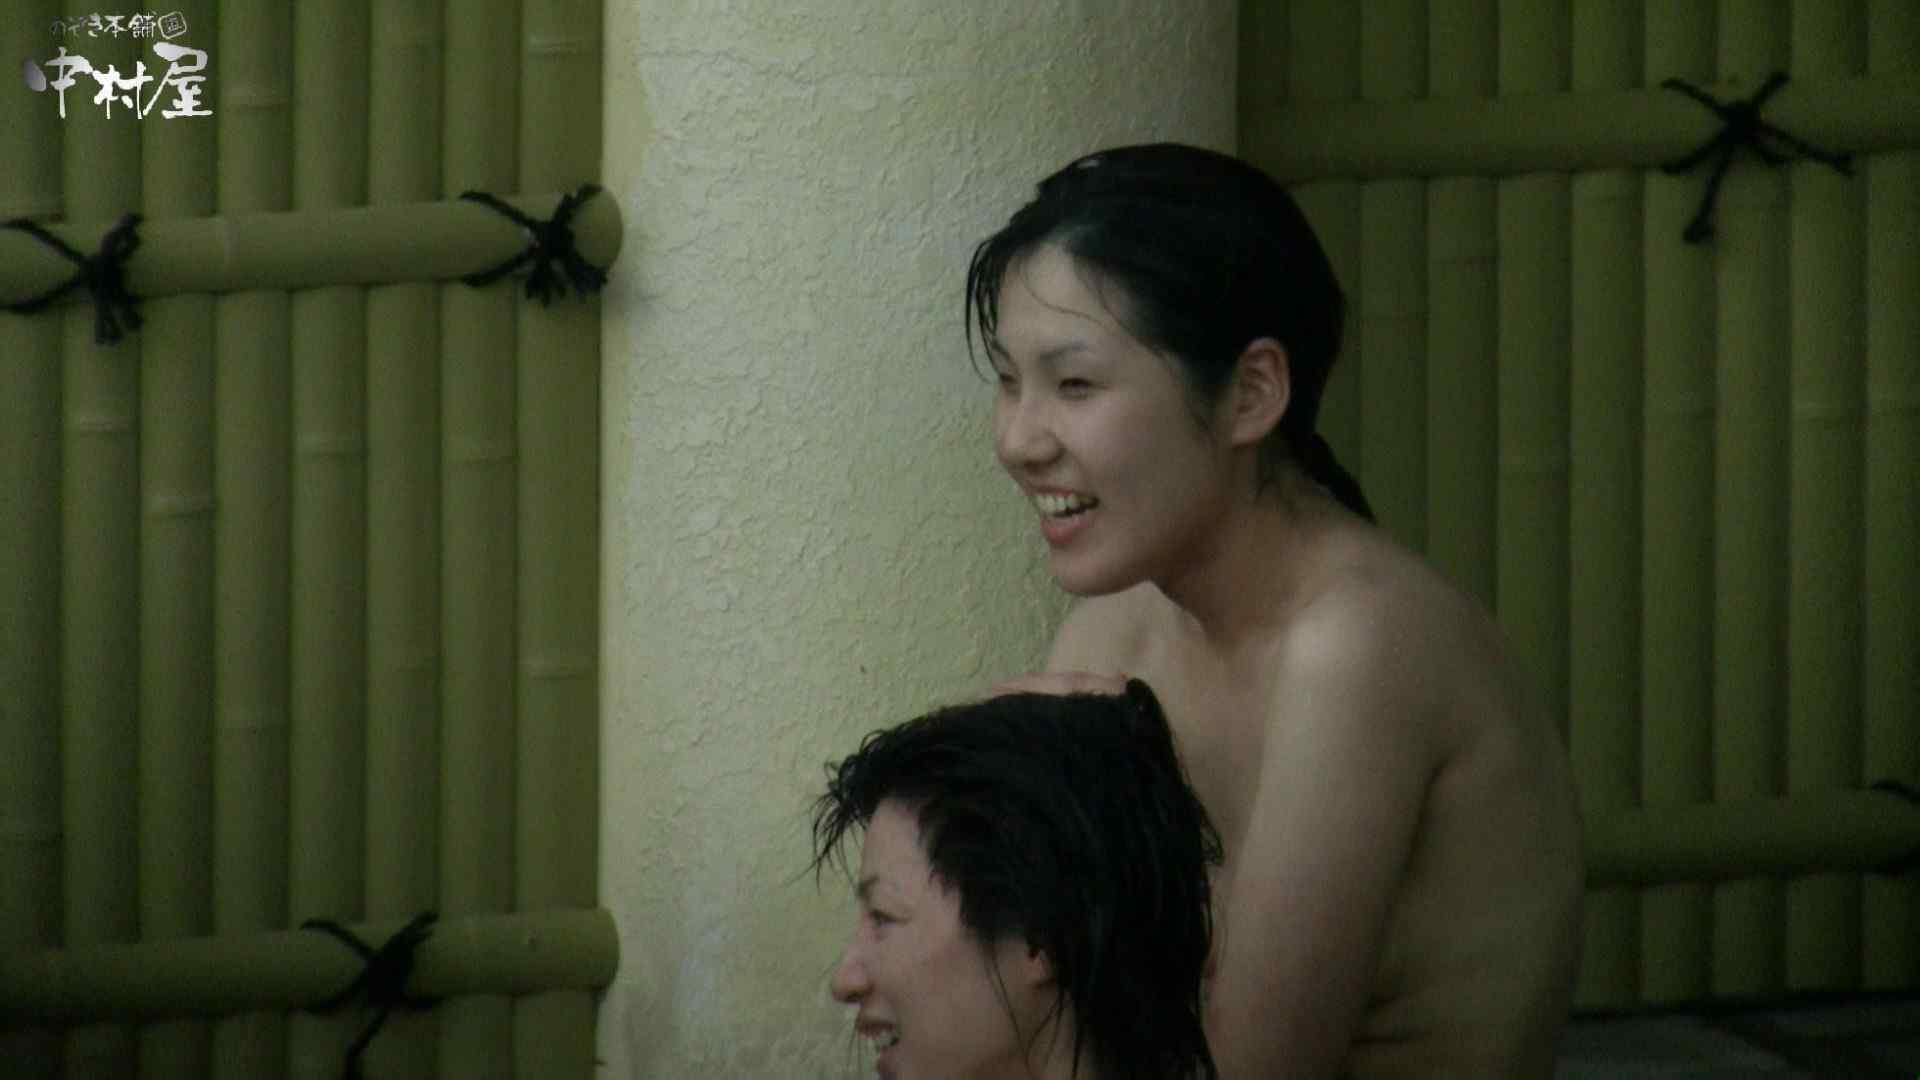 Aquaな露天風呂Vol.983 OL女体  53連発 24